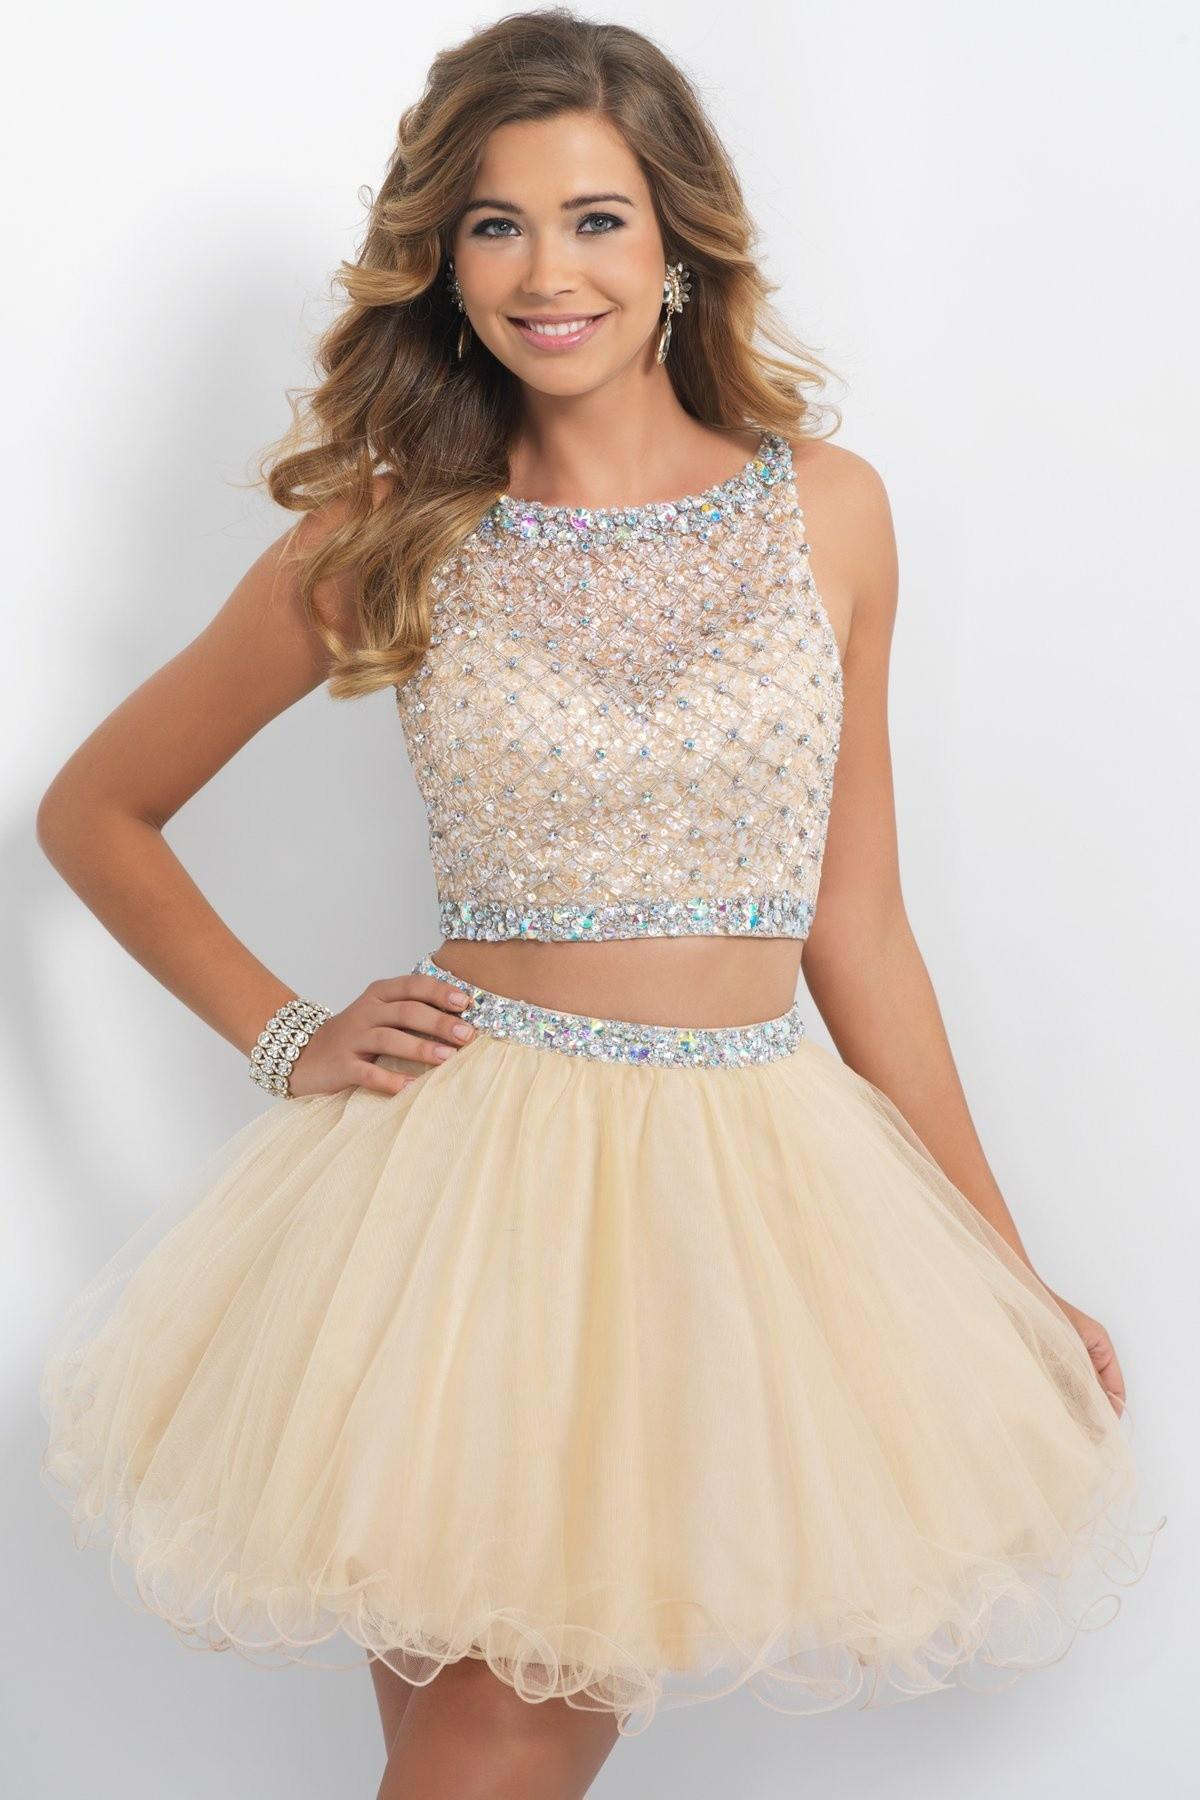 Cheap Homecoming Dresses Under 100 - RI72ICMV